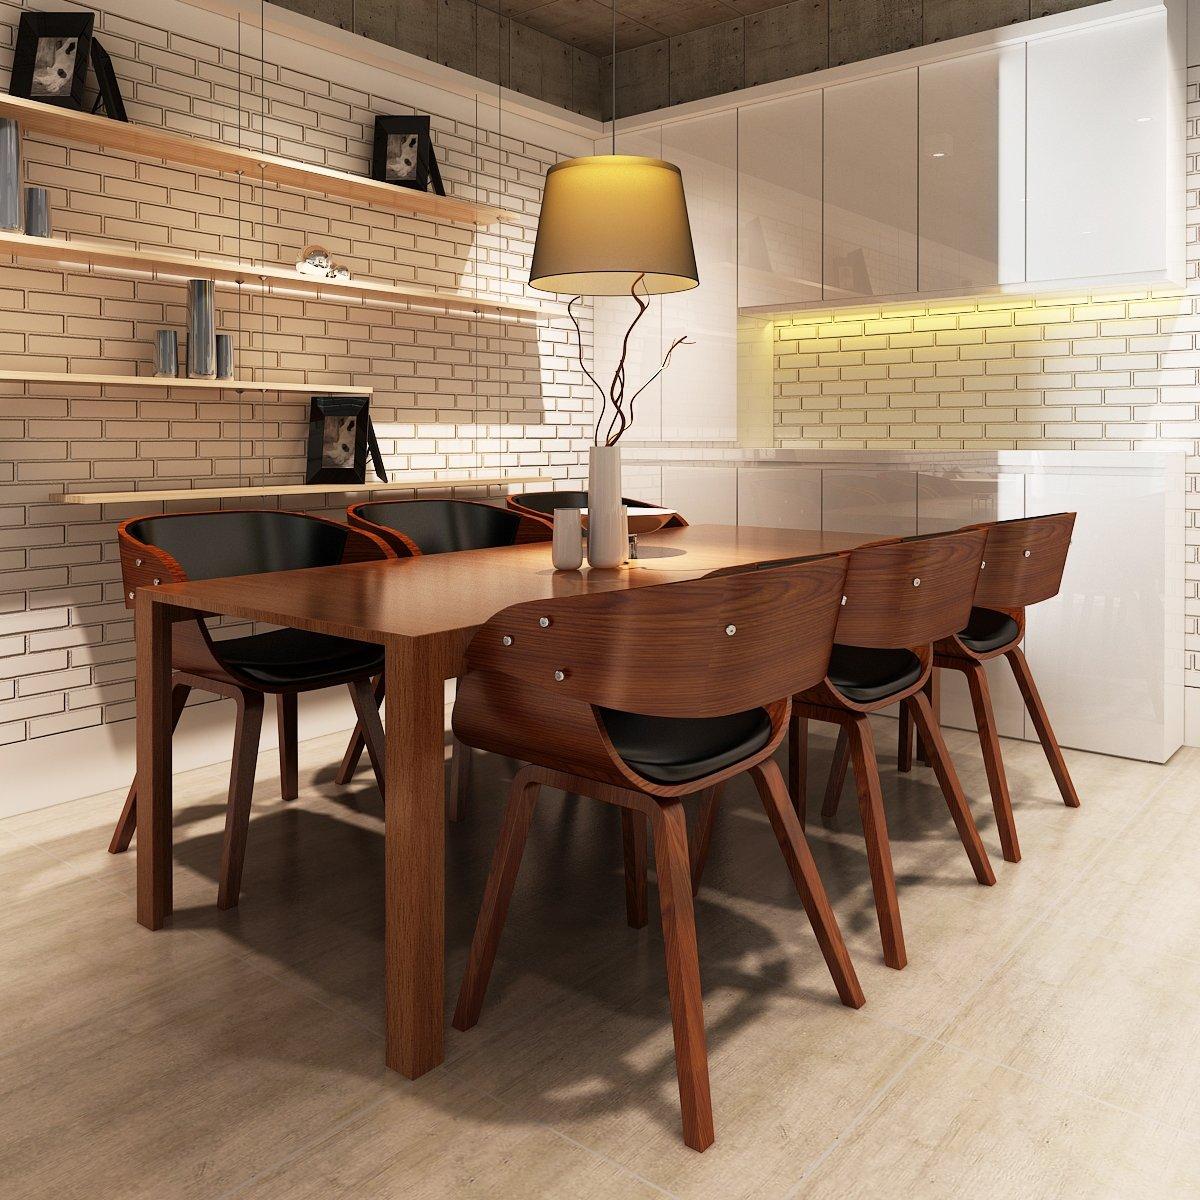 vidaXL Eetkamerstoelen Shanghai hout bruin 6 st